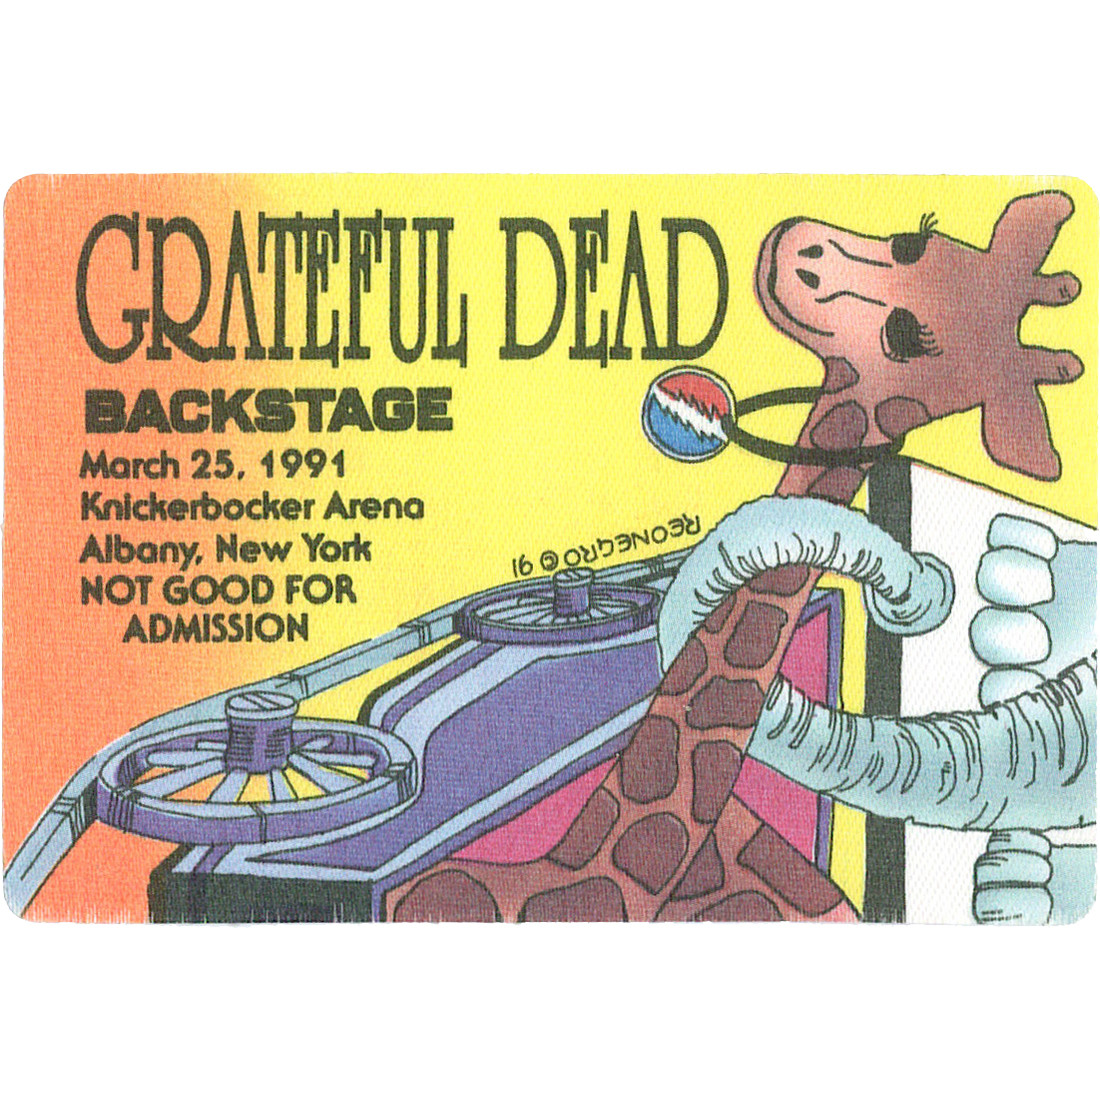 Grateful Dead 1991 03-25 Backstage Pass